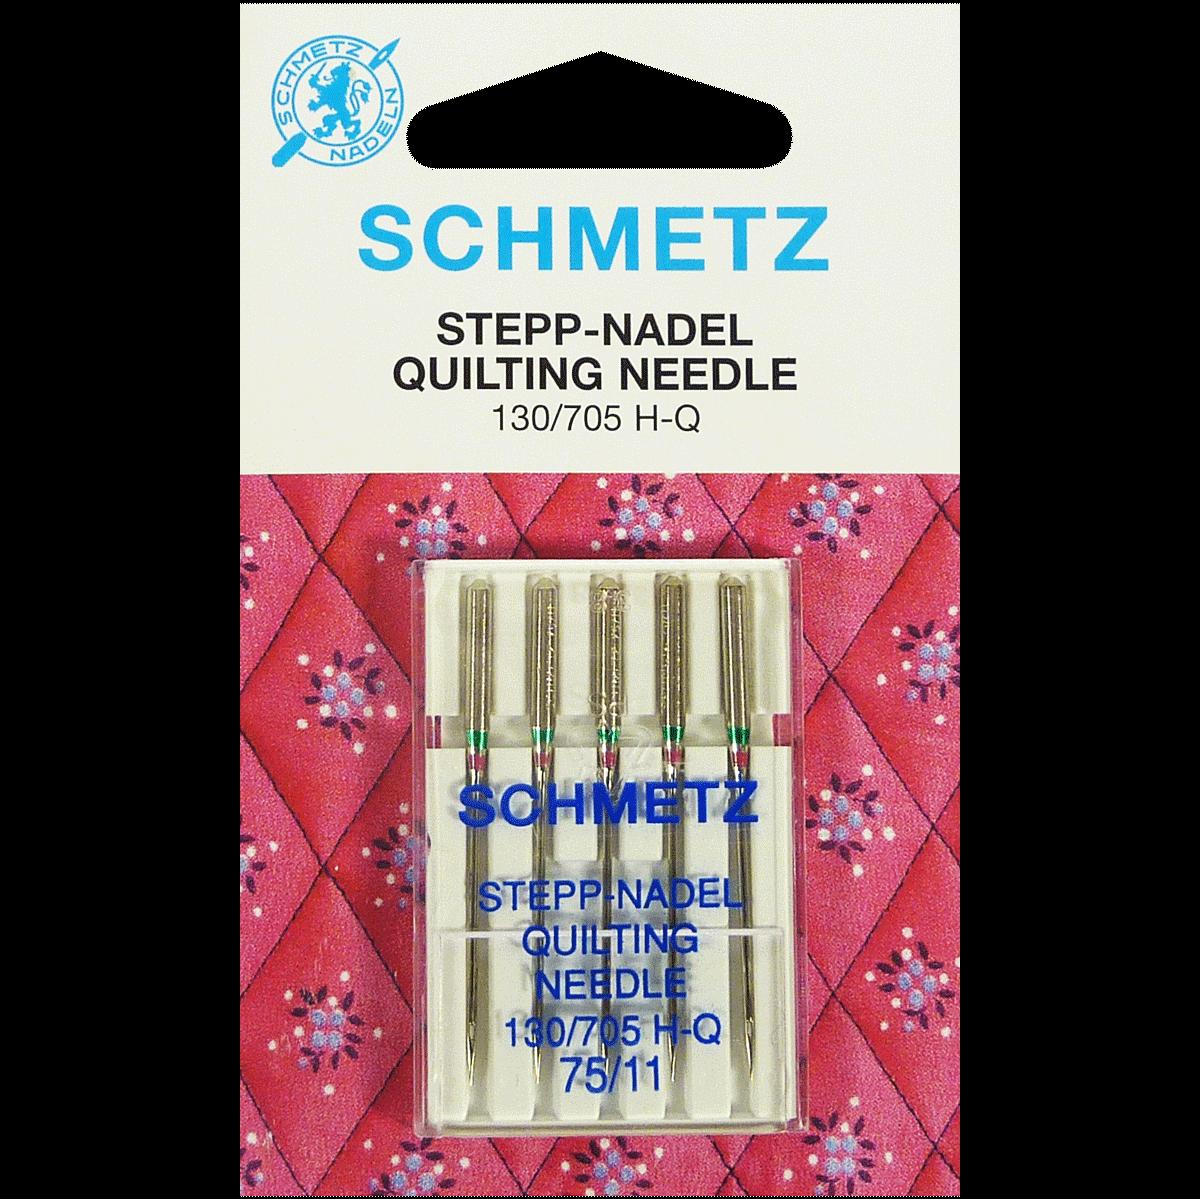 Quilting Needle Schmetz Monfil Ca